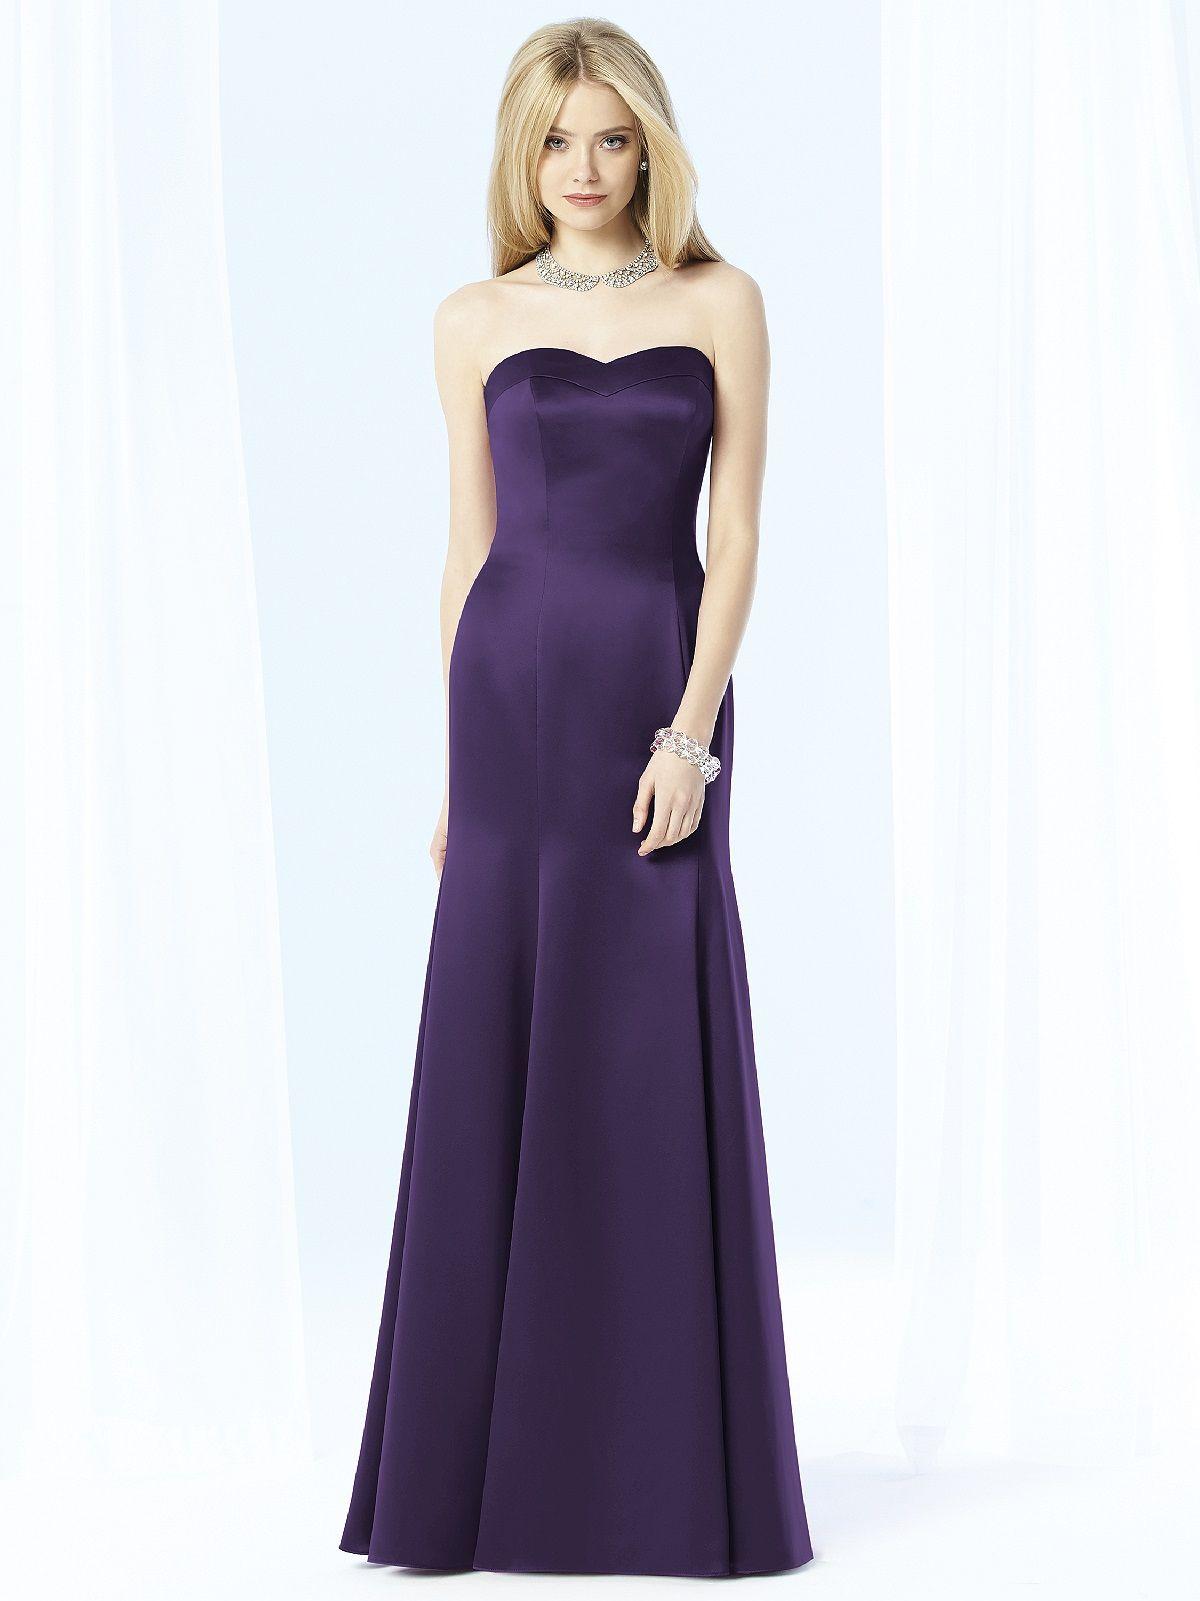 Encantador Modestos Vestidos De Dama De Reino Unido Cresta - Vestido ...